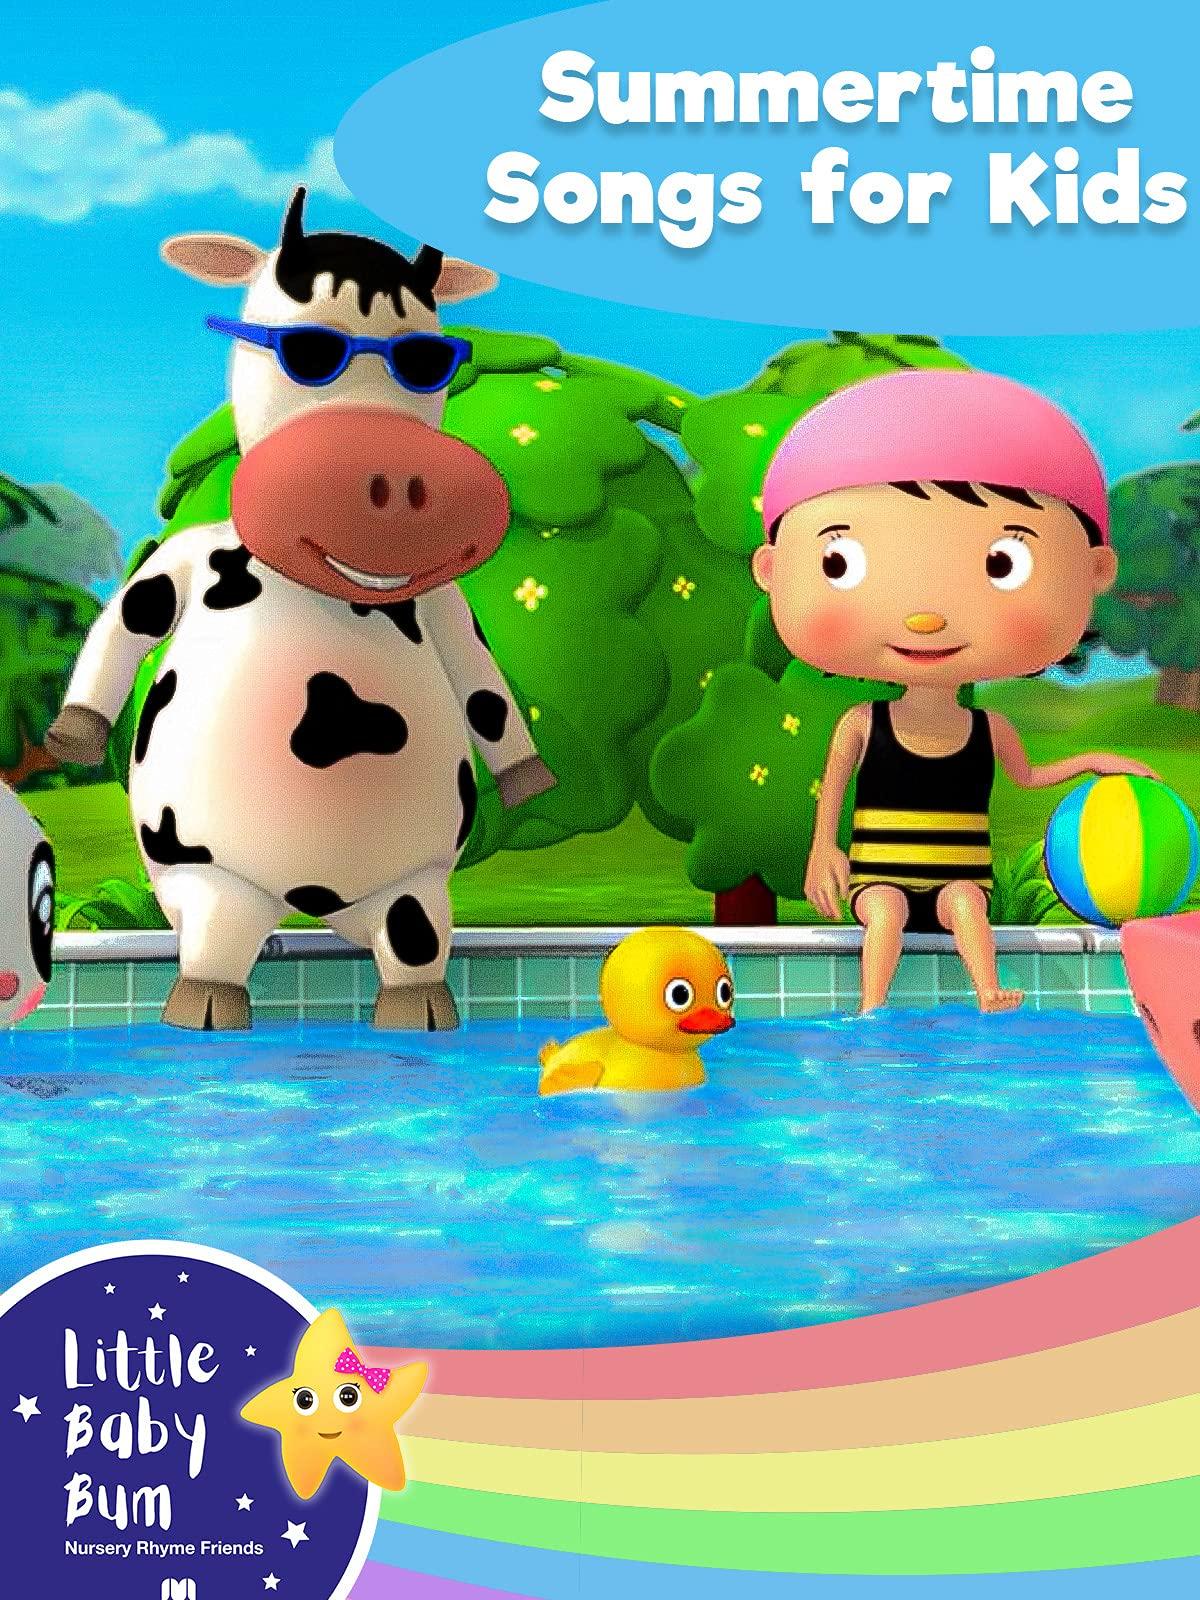 Little Baby Bum - Summertime Special